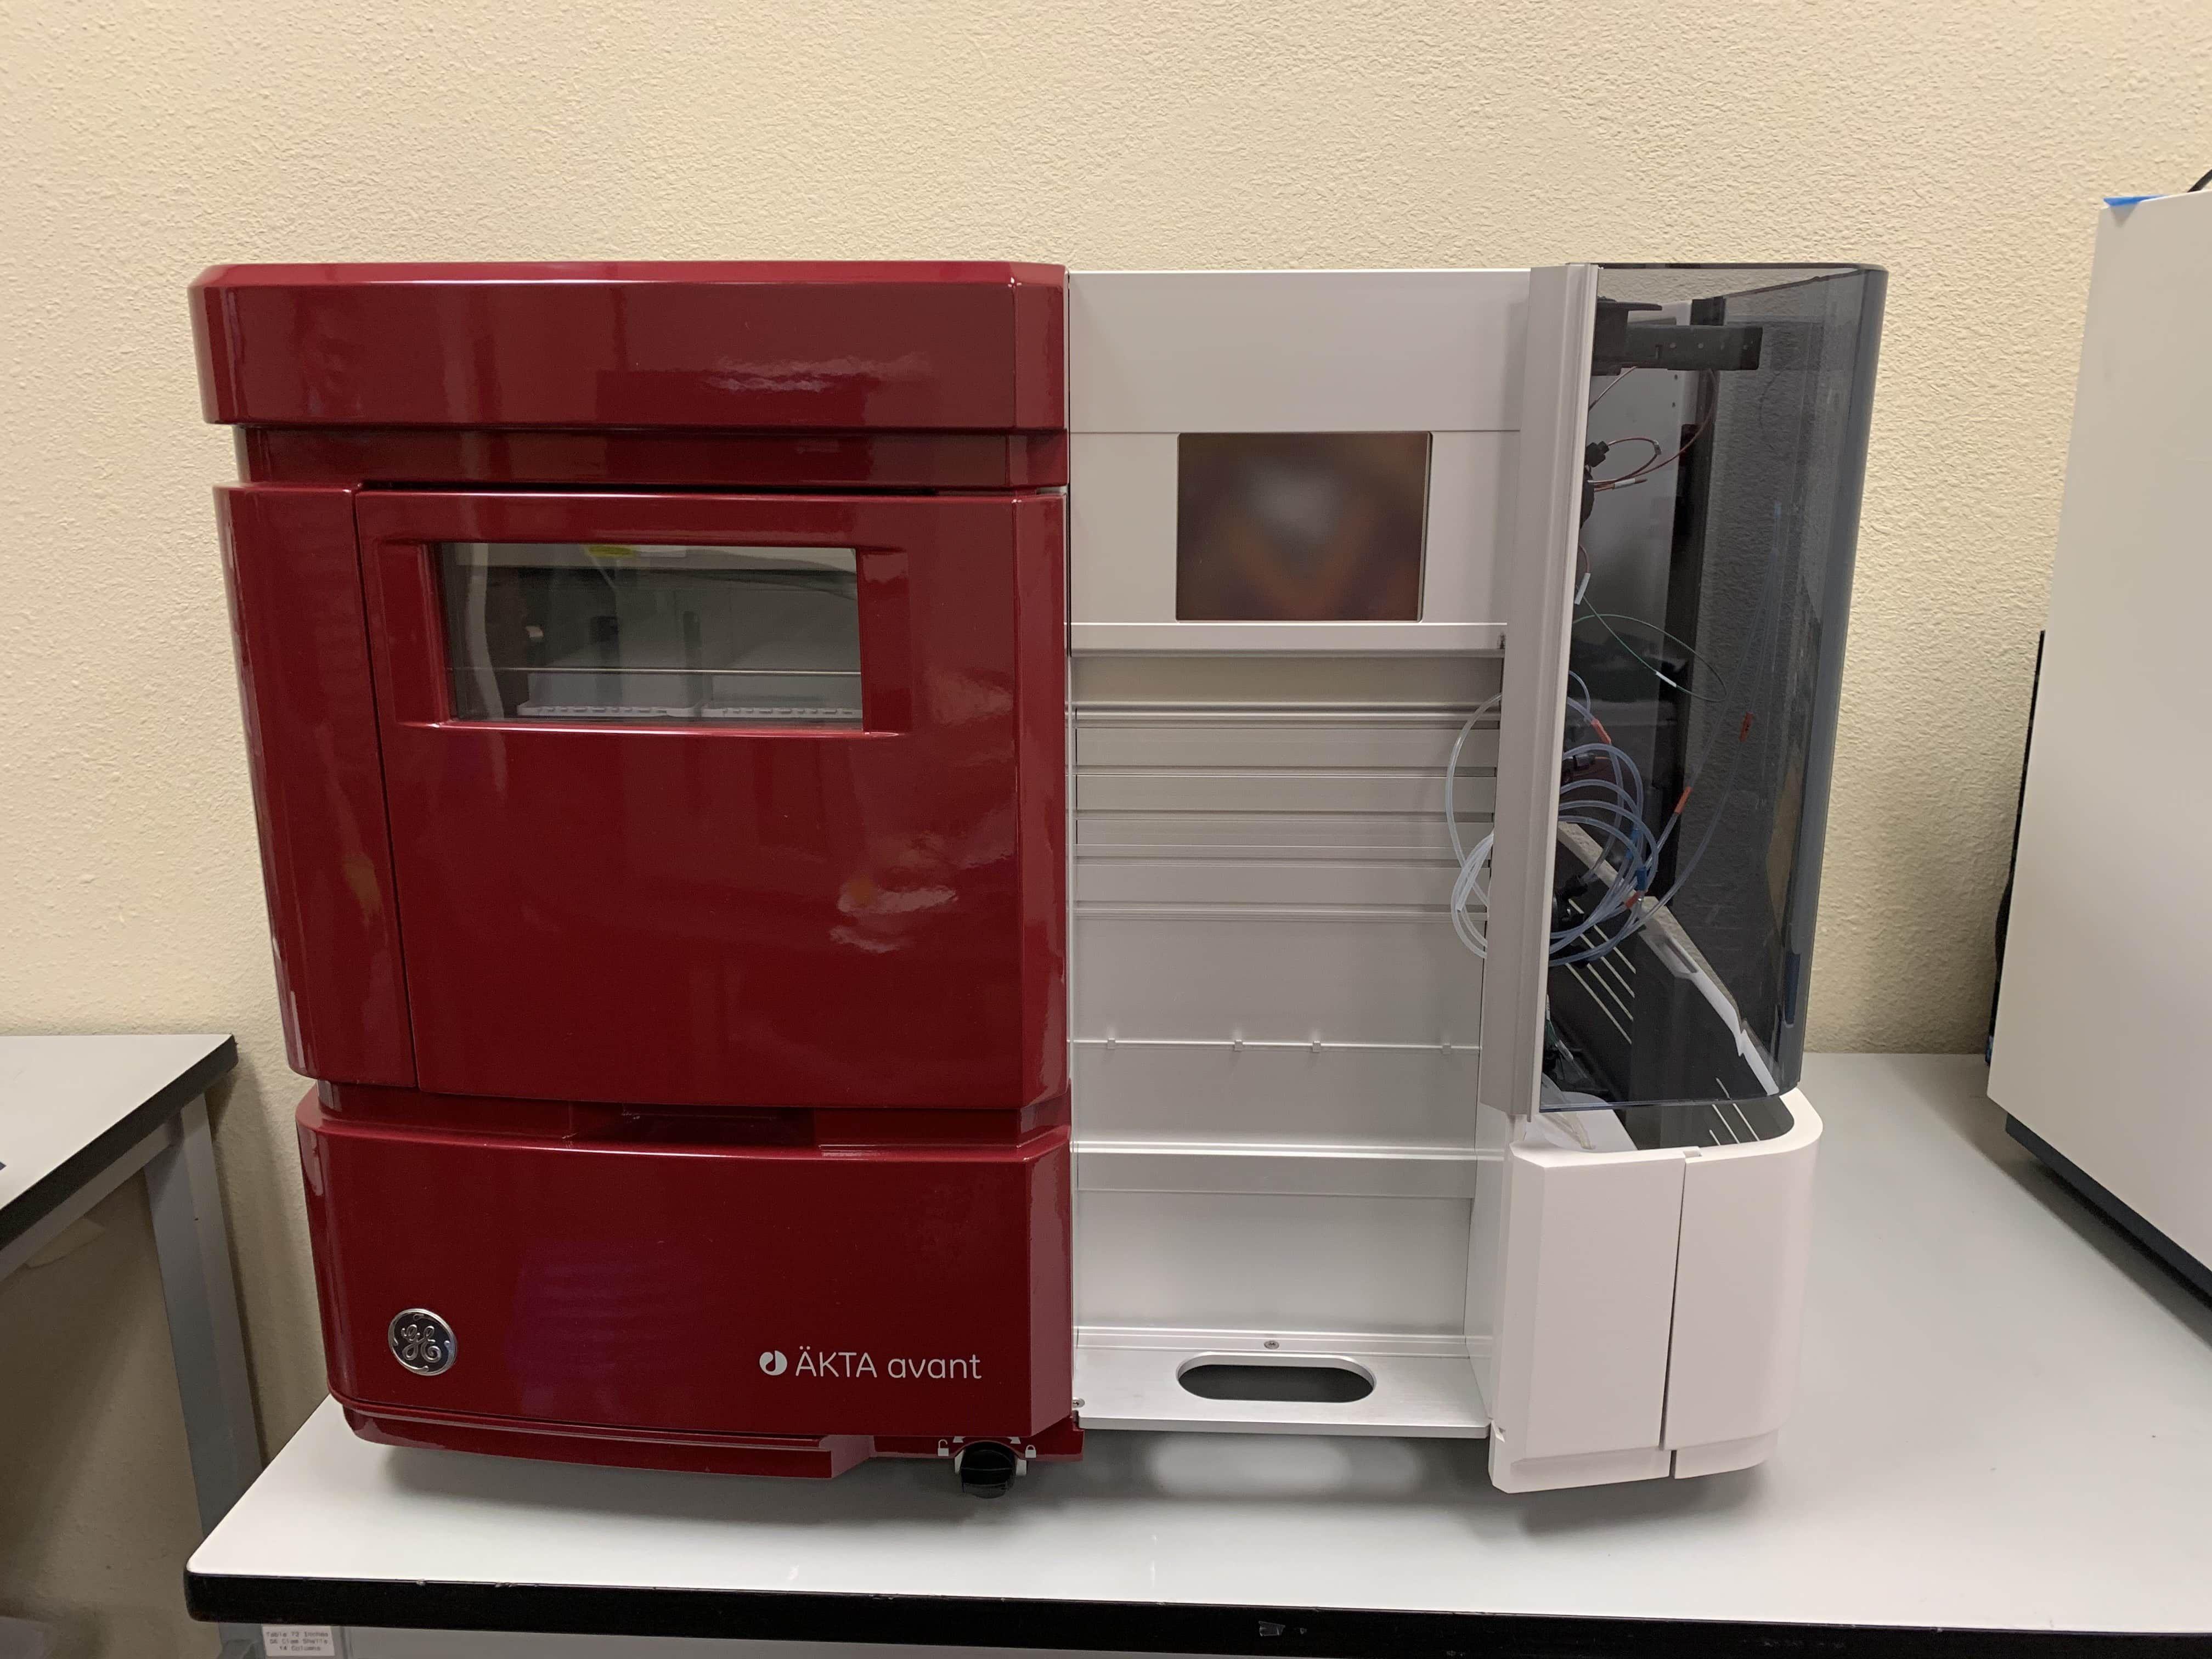 GE AKTA Avant 25 chromatography system- Certified with Warranty